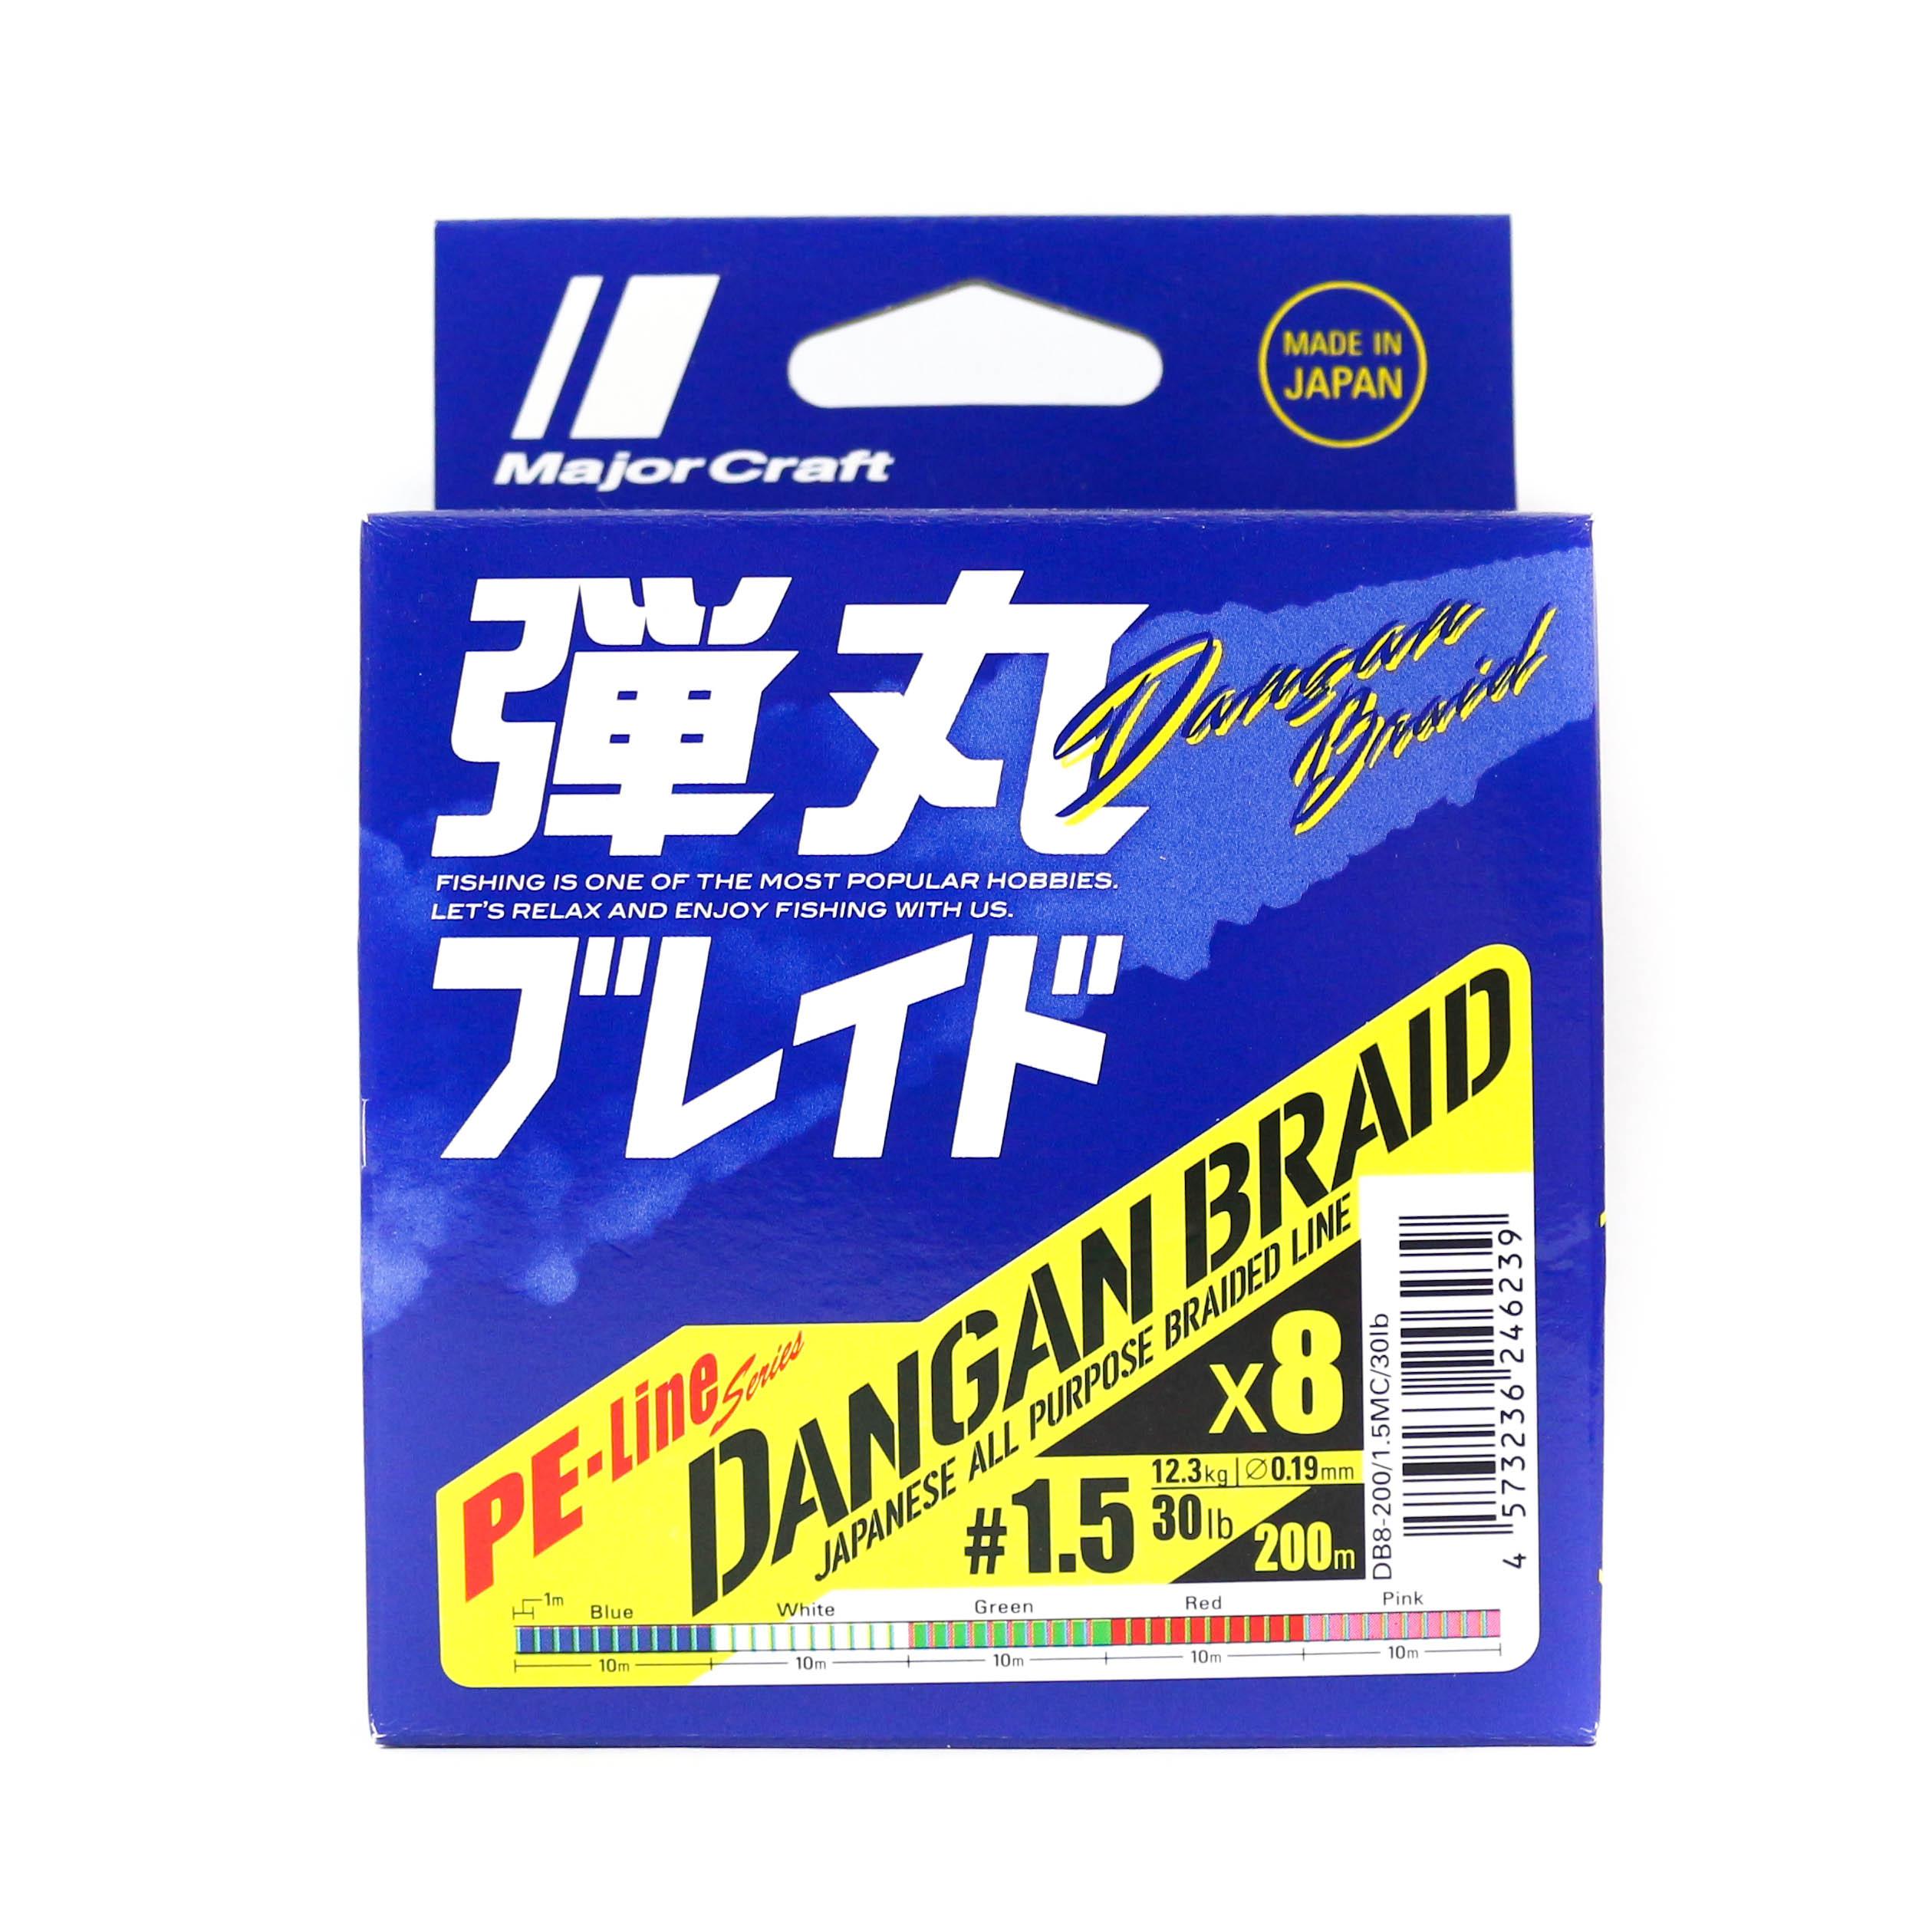 Major Craft Dangan Braided Line X8 200m P.E 1.5 Multi DB8-200/1.5MC/30lb (6239)